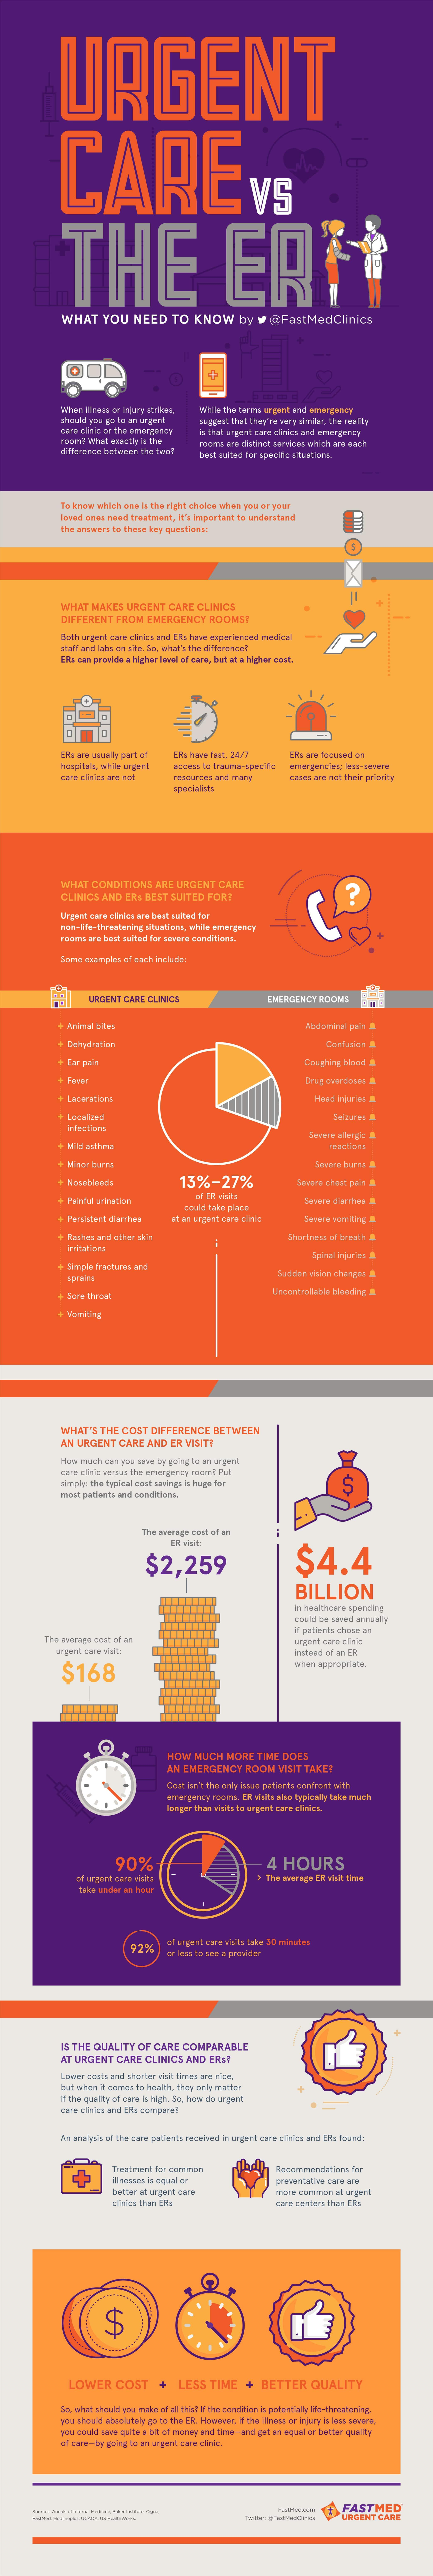 Urgent Care vs ER Infographic